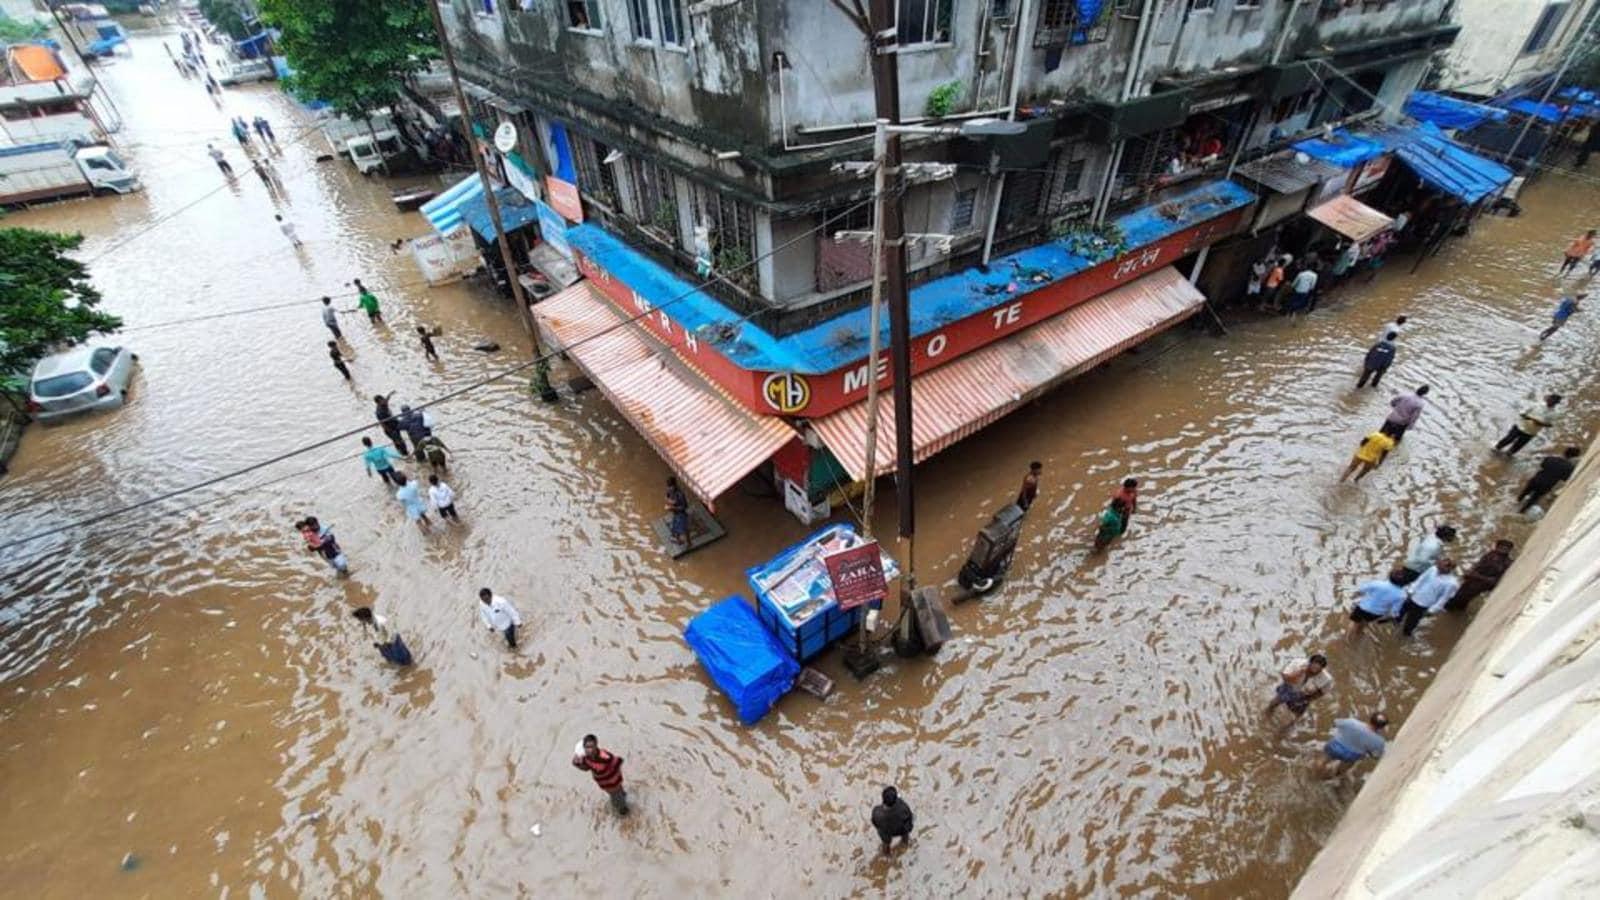 Parts of Kalyan, Bhiwandi flooded as rivers overflow after rains in  Maharashtra | Mumbai news - Hindustan Times